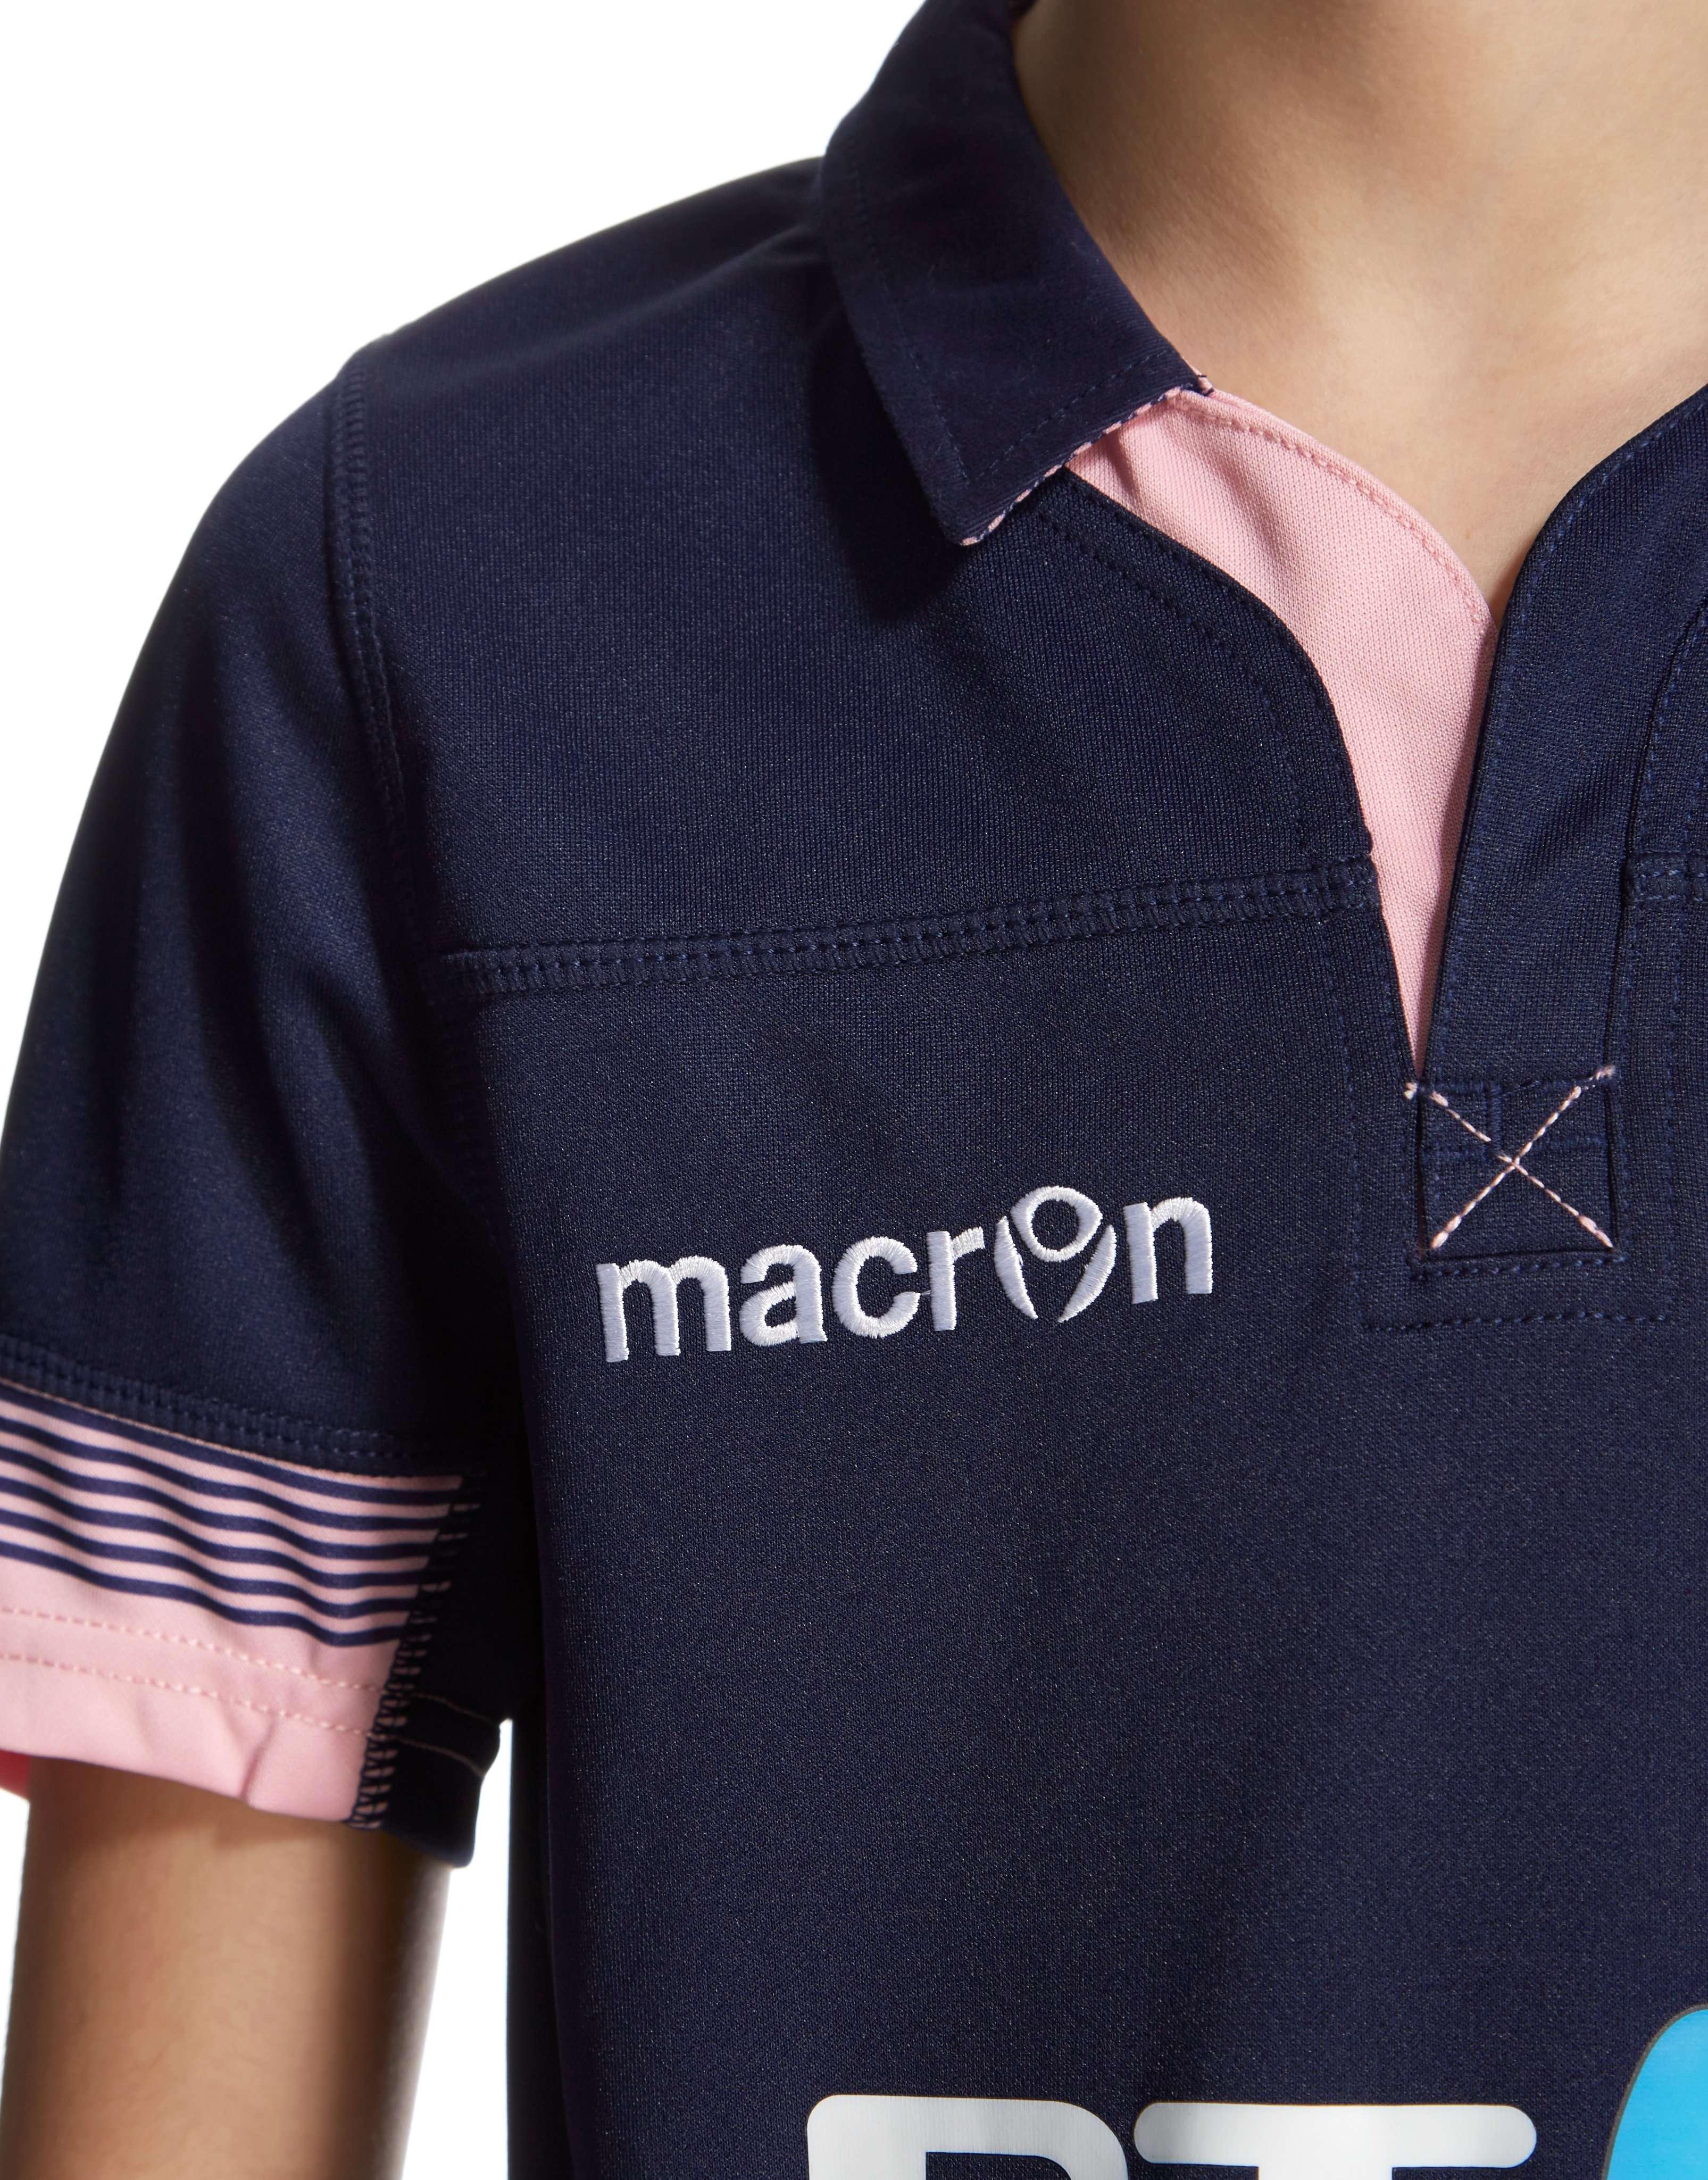 Macron Scotland RFU Home 2015/16 Sevens Shirt Junior